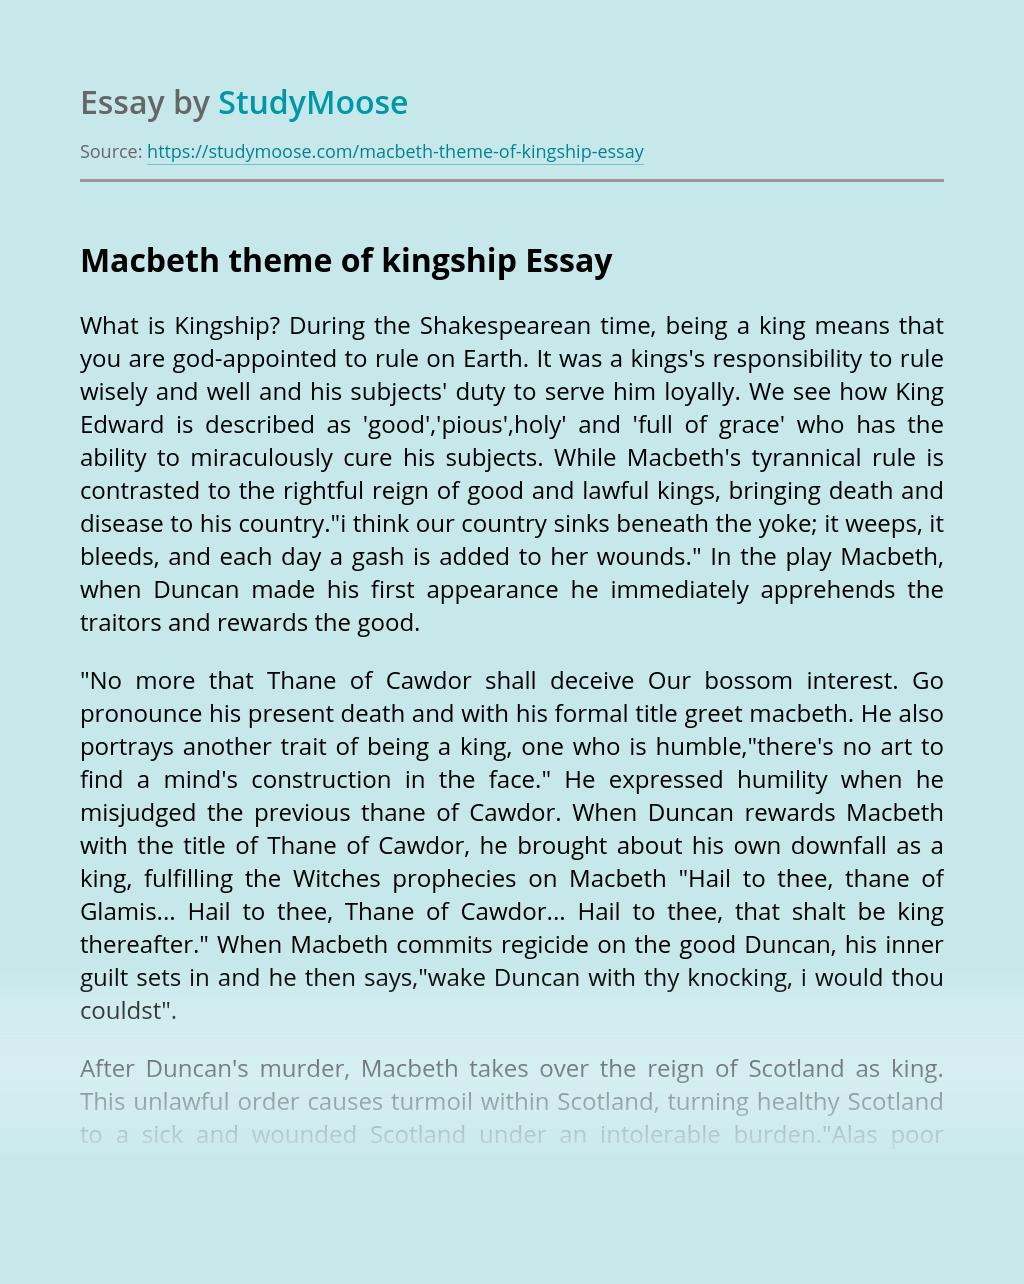 Macbeth theme of kingship